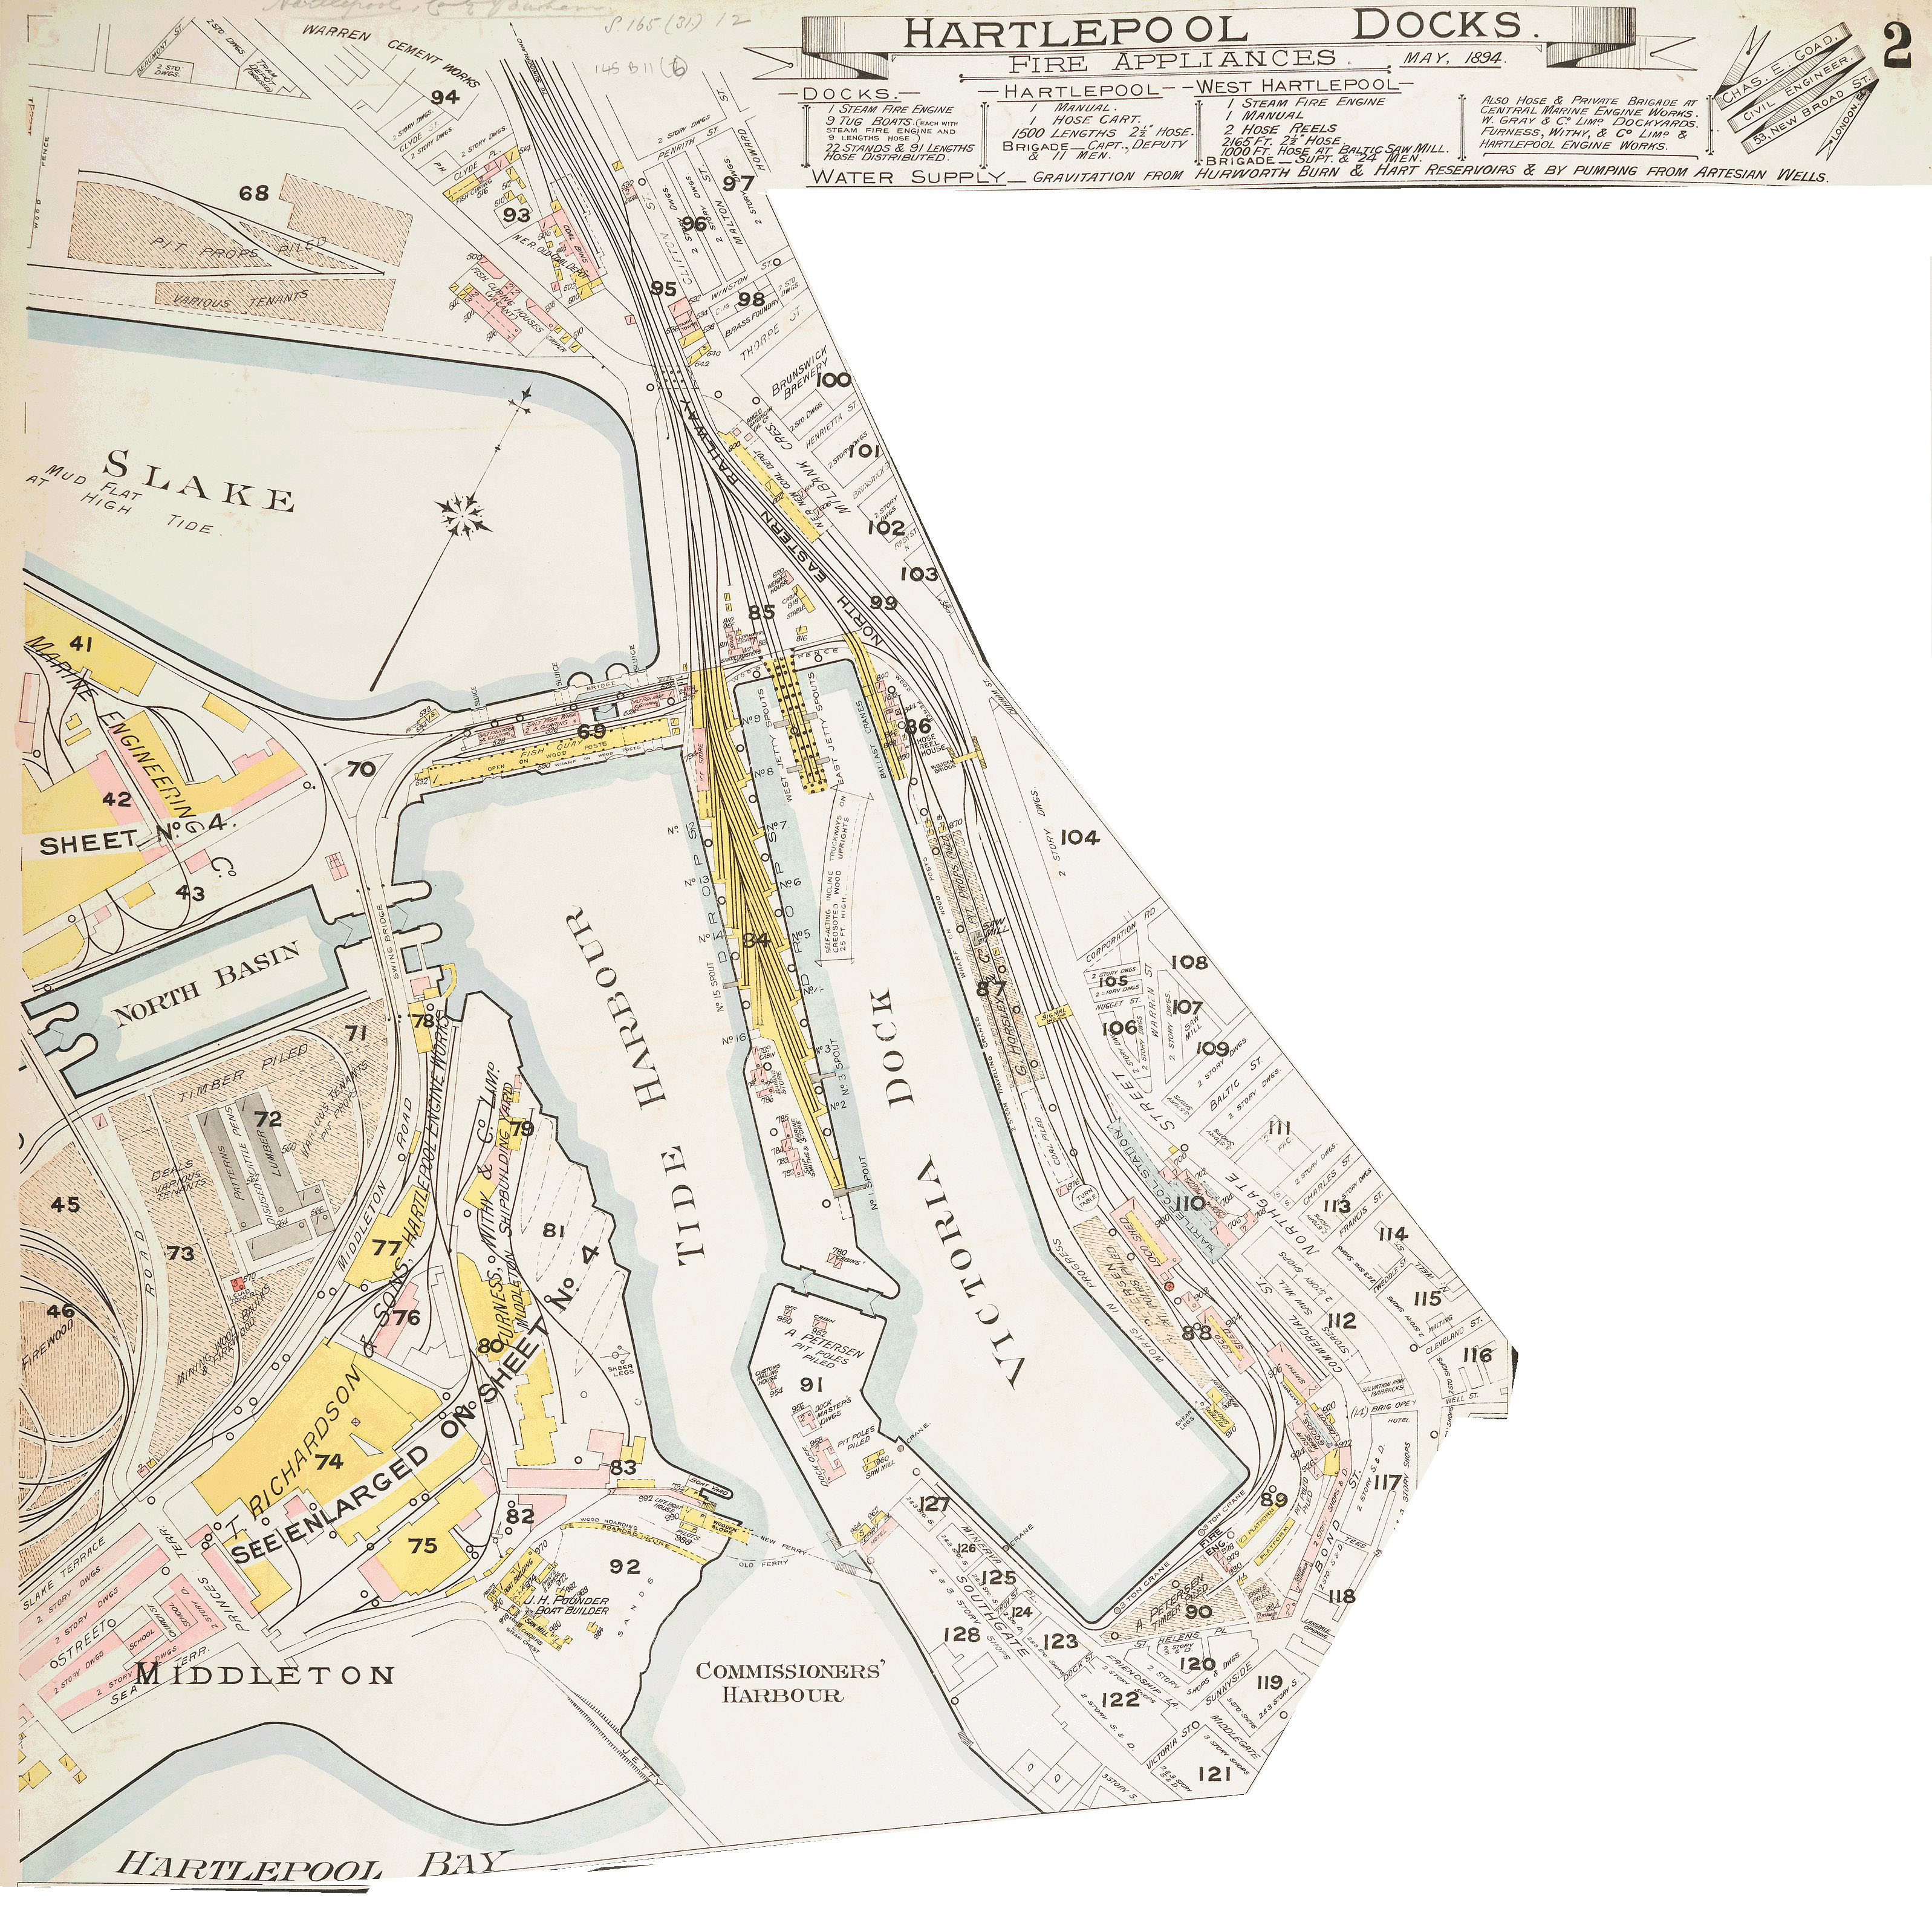 Hartlepool_Docks;_sheet_2-1_(BL_148238)